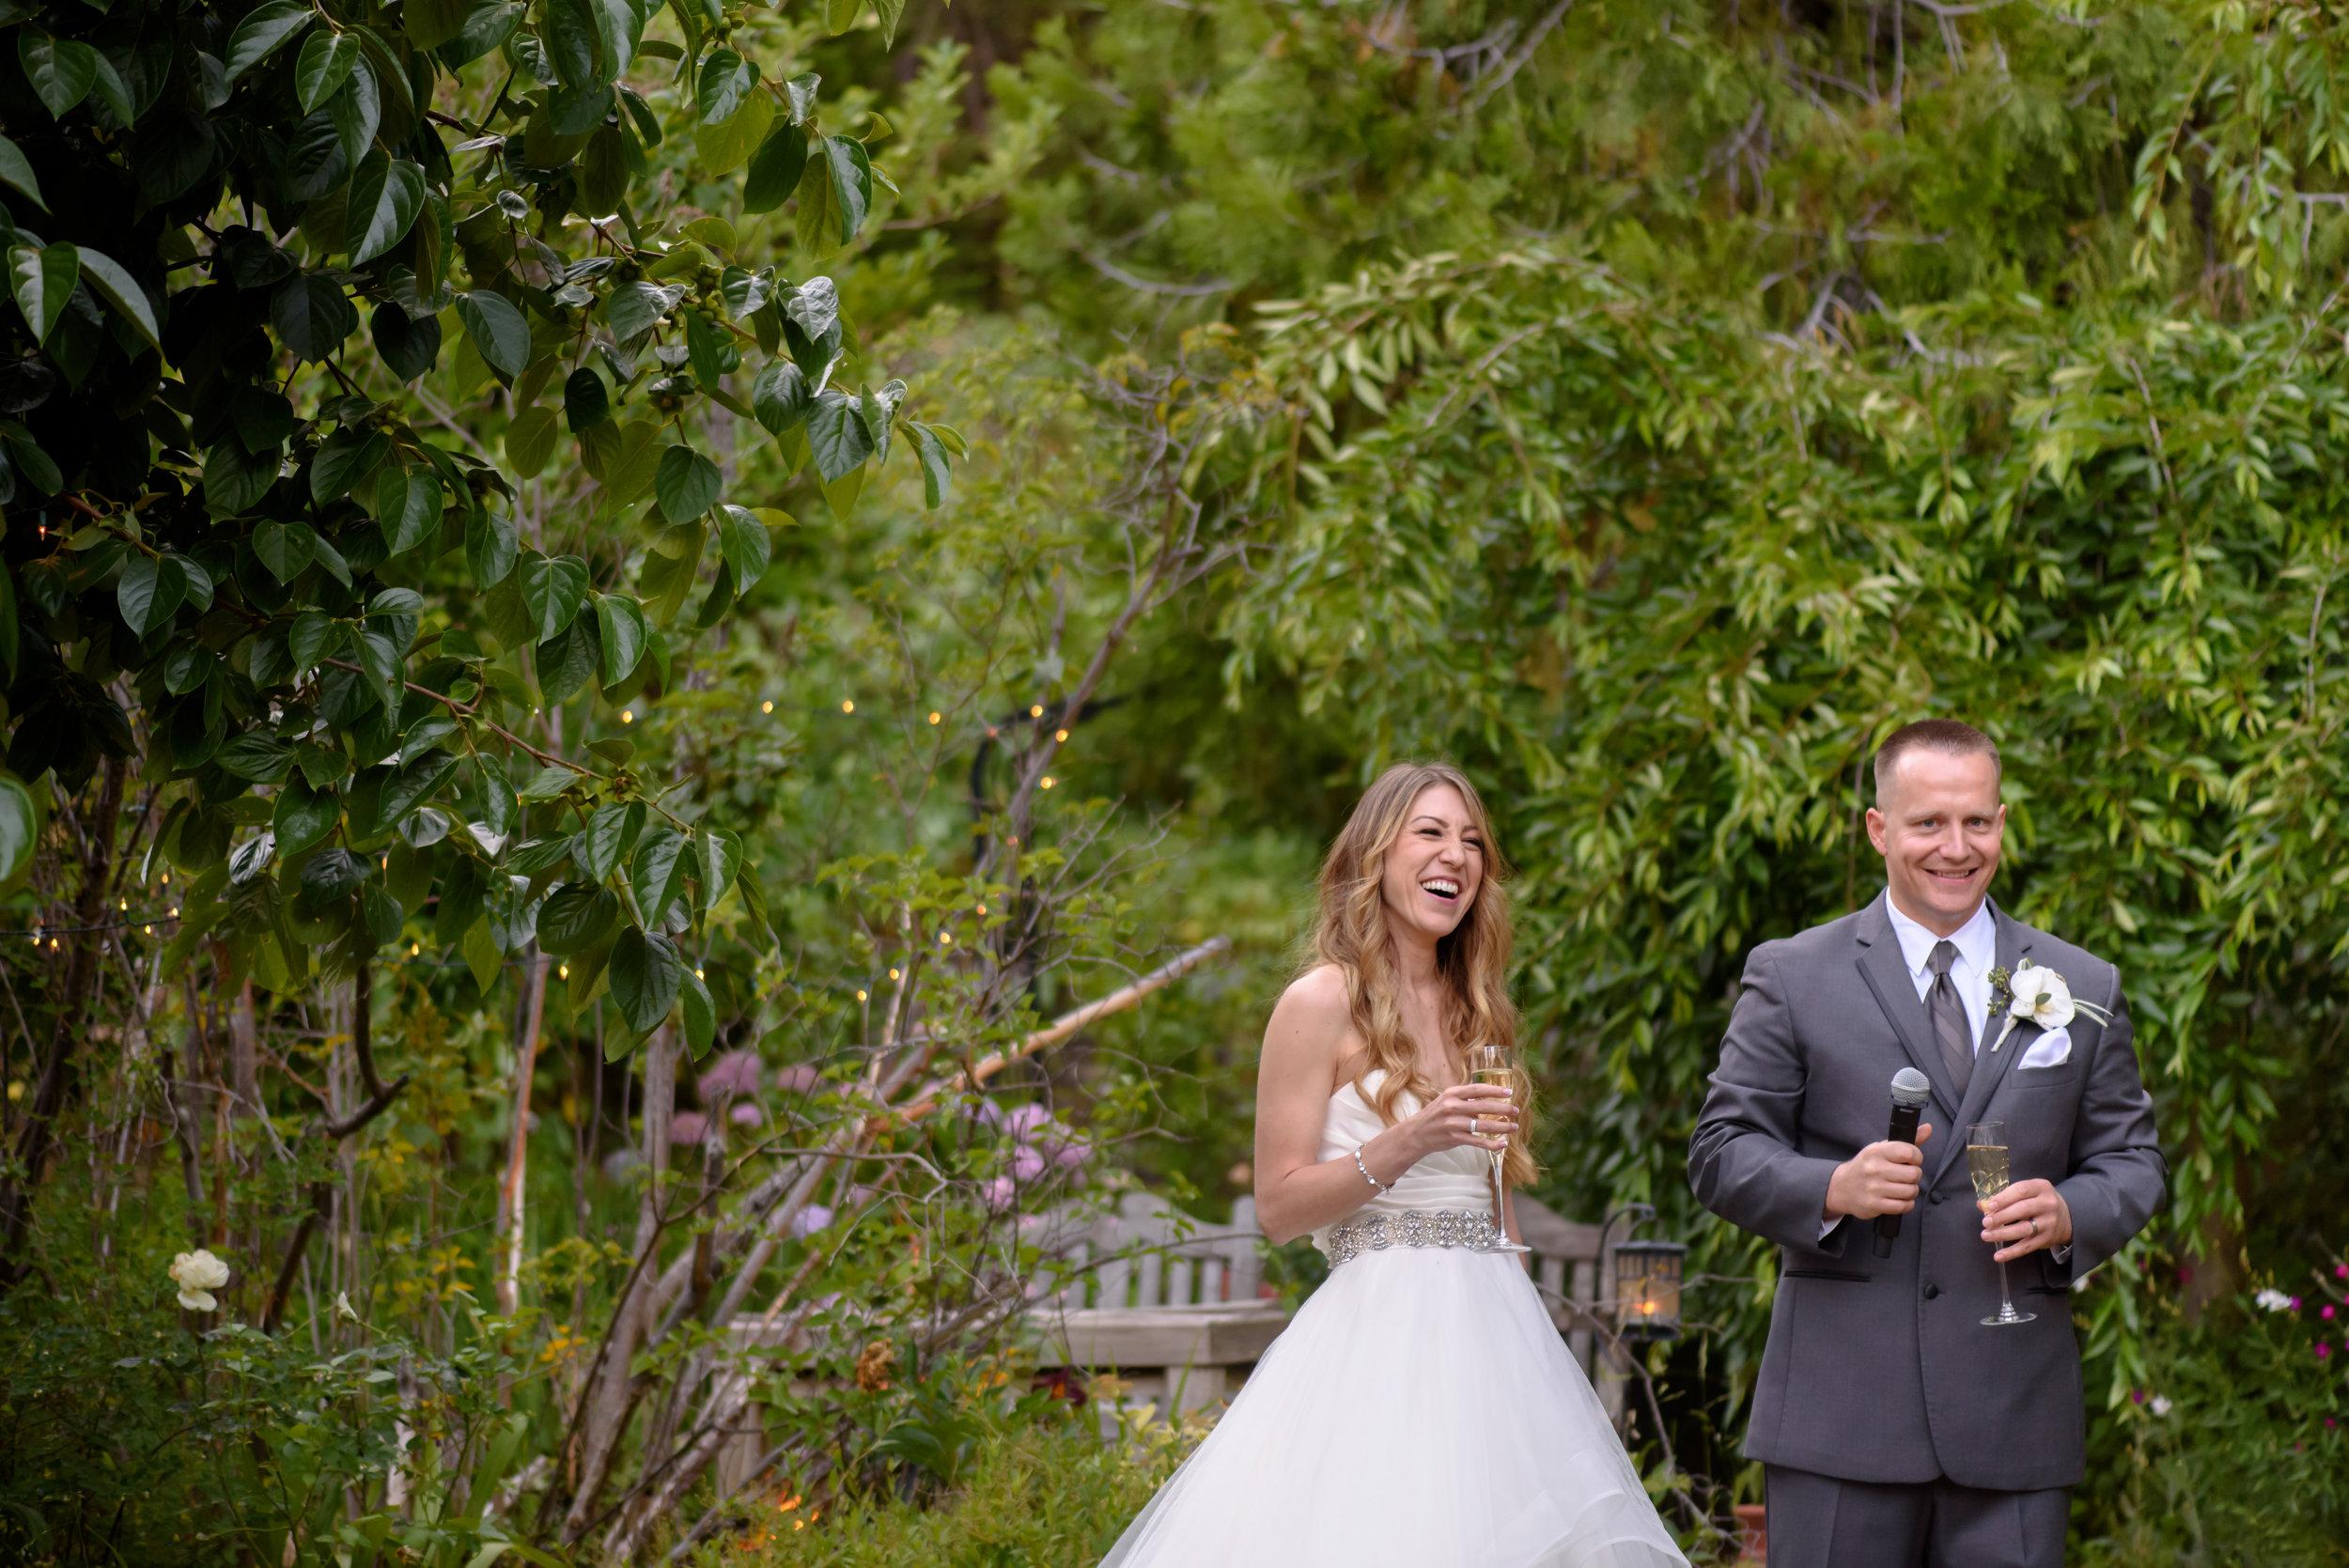 nicole-luke-032-onte-verde-inn-foresthill-wedding-photographer-katherine-nicole-photography.JPG